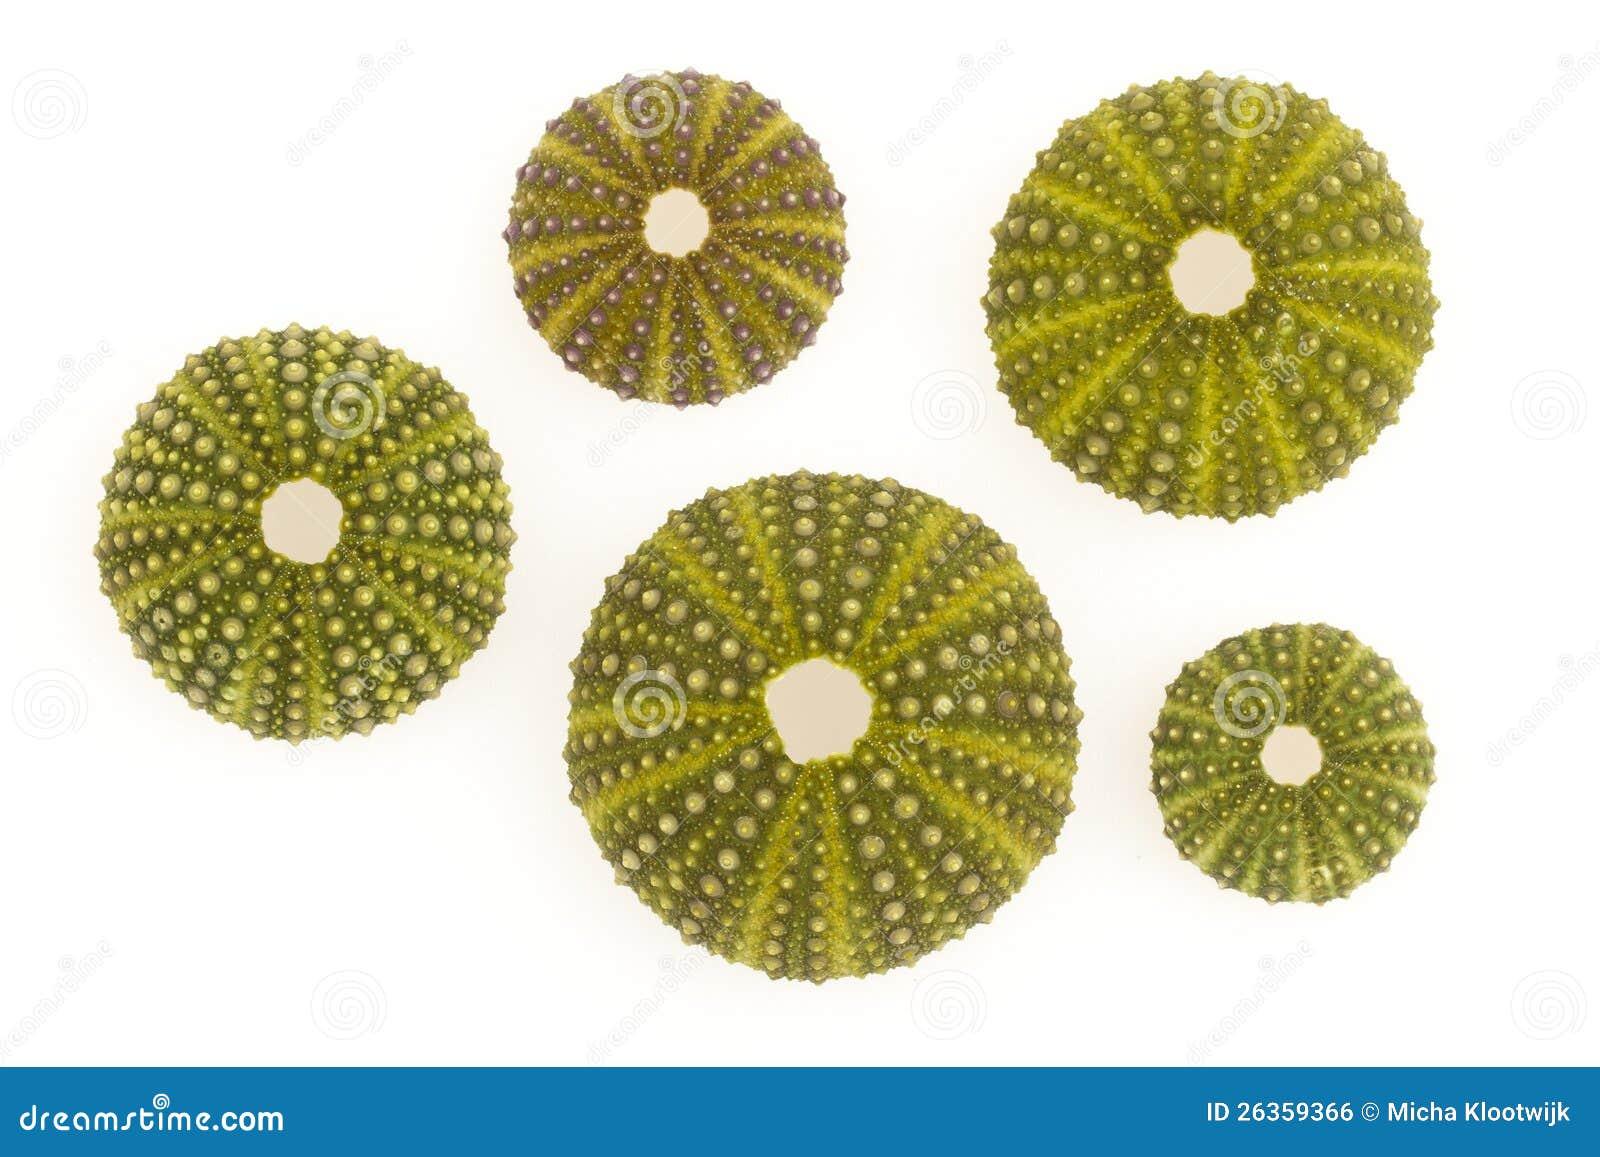 Getrennte grüne Seeigel